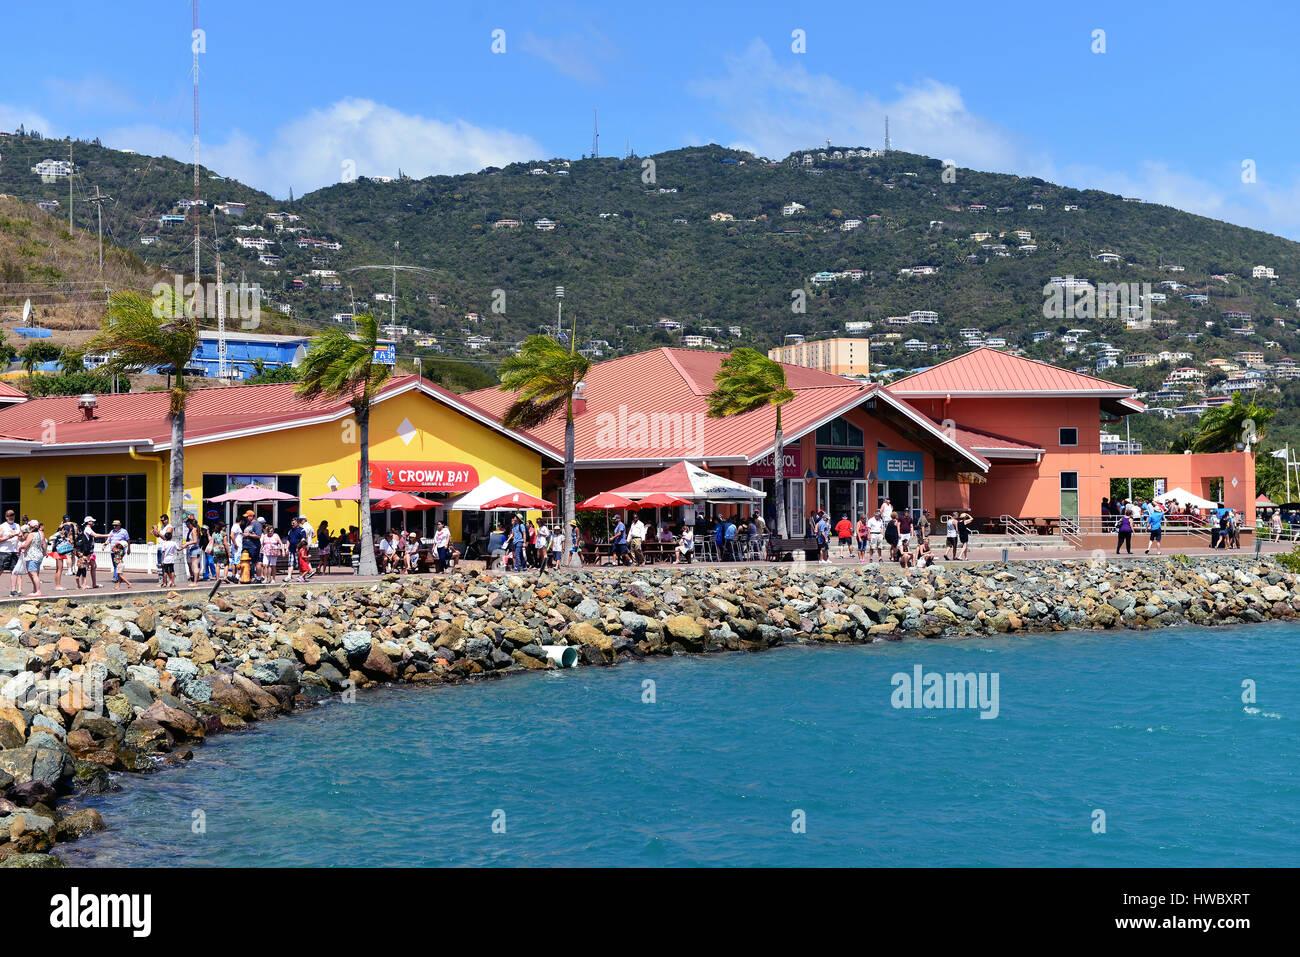 St. Thomas, US Virgin Islands - 1. März 2017: The Crown Bay Center ...